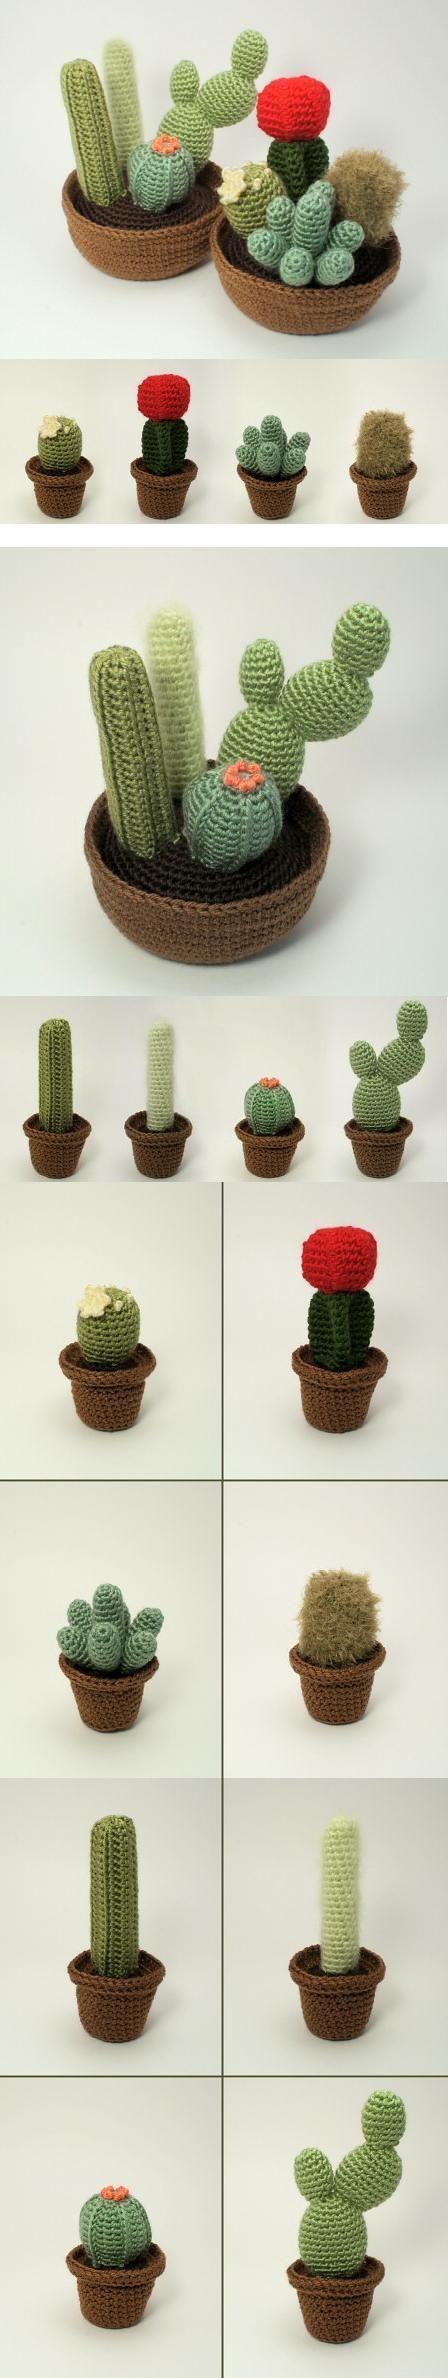 http://www.planetjune.com/blog/cactus-collection-crochet-patterns/ Hermosos Cactus!!!